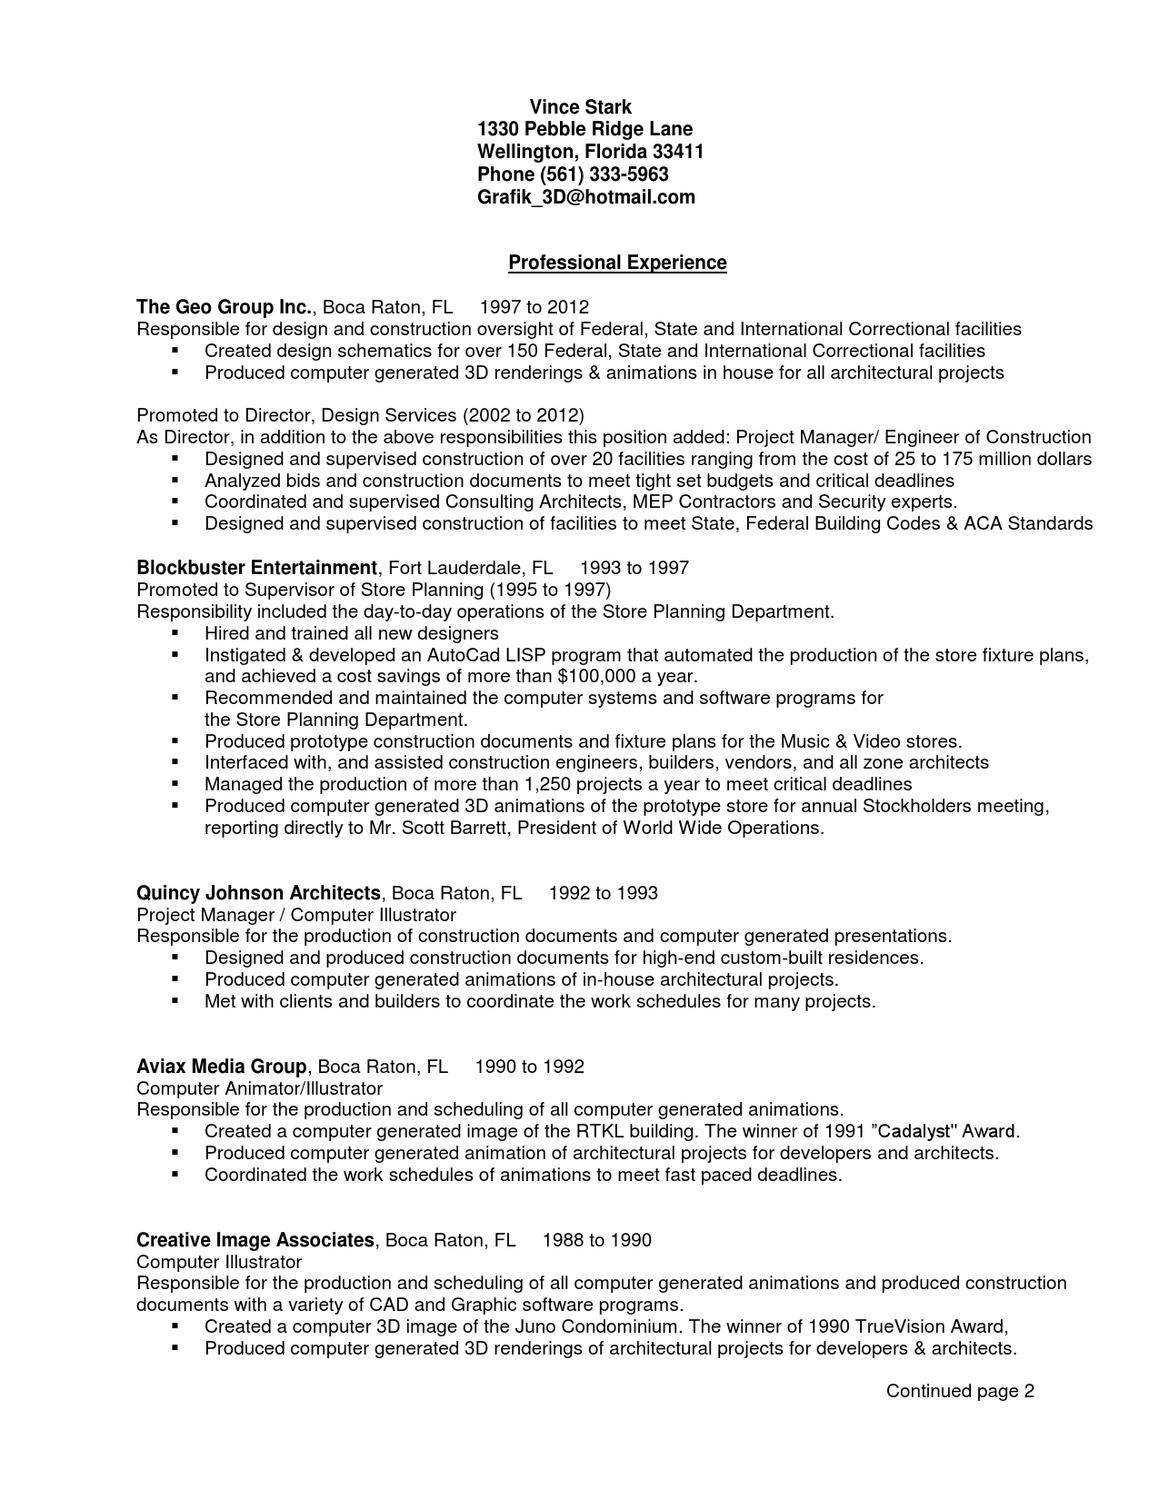 resume by Vince Stark - issuu